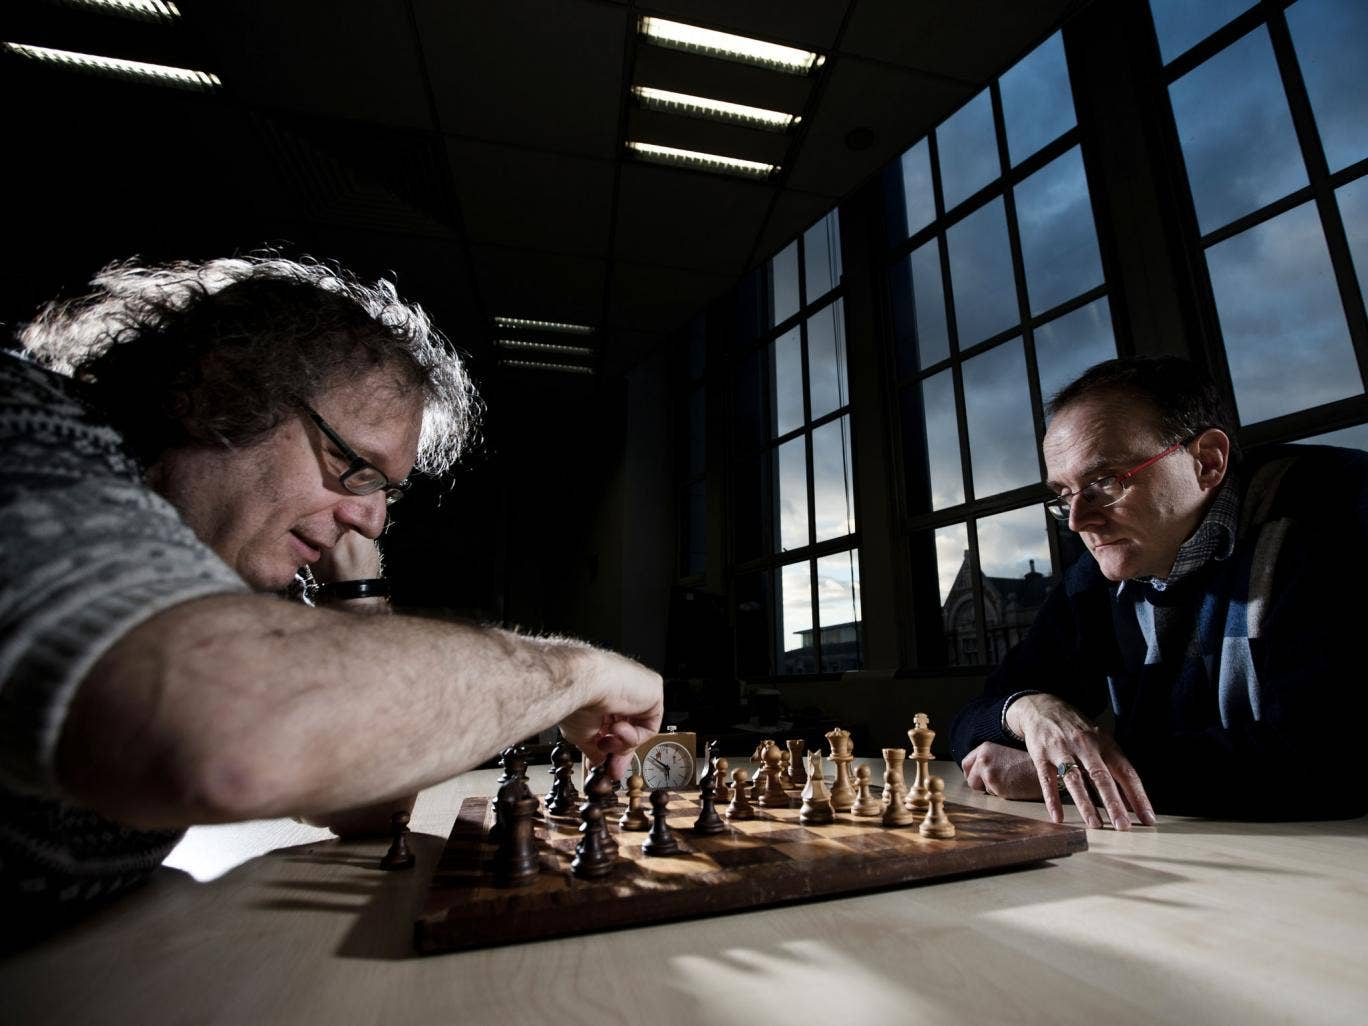 Jon Speelman plays against auction winner Stephen Woodhouse